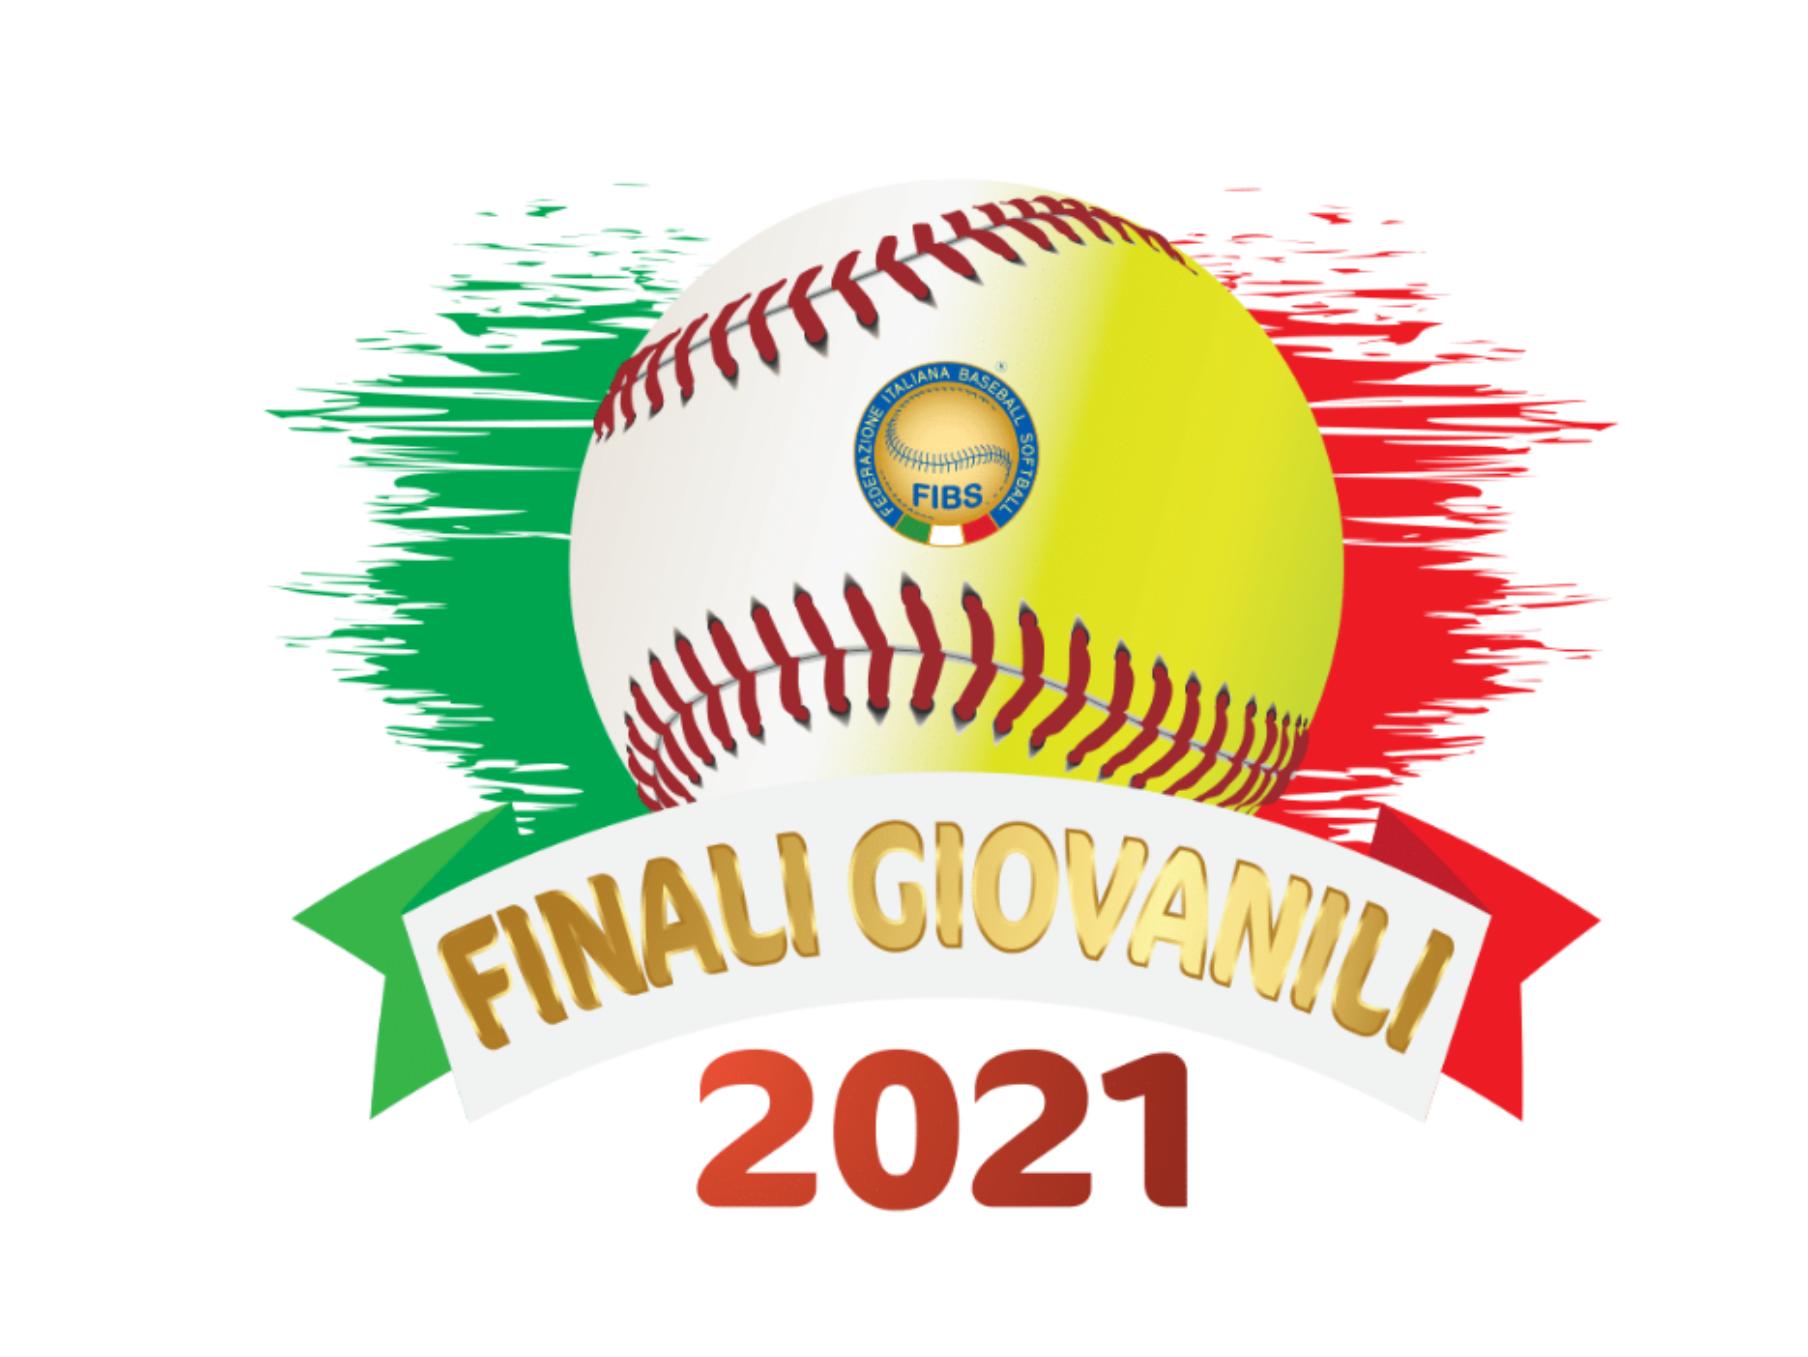 Finali Giovanili 2021